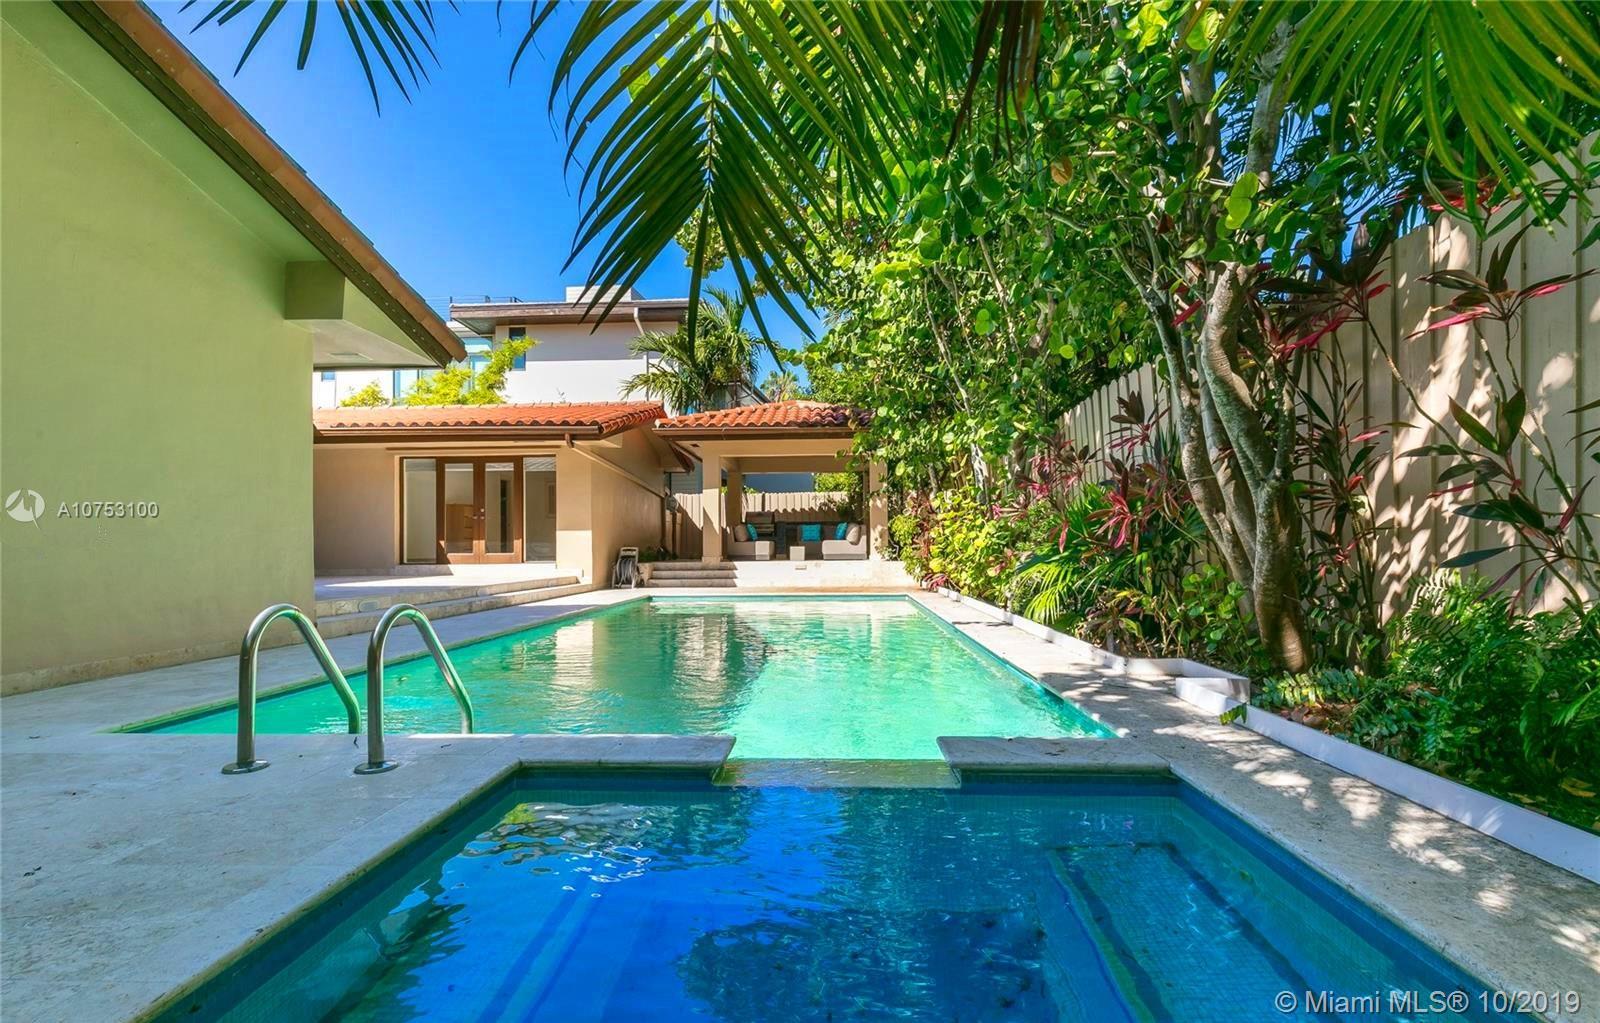 image #1 of property, Tropical Isle Homes Sub 4